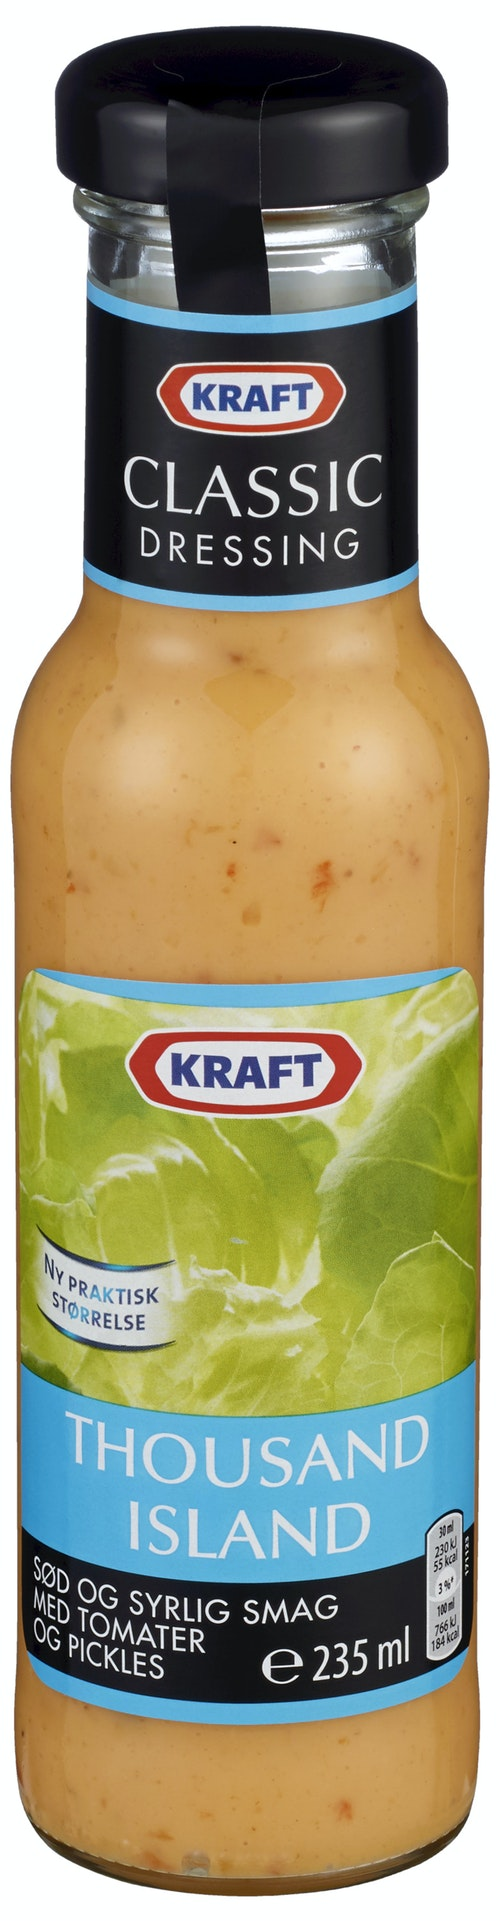 Kraft Kraft Thousand Island Dressing 235 ml